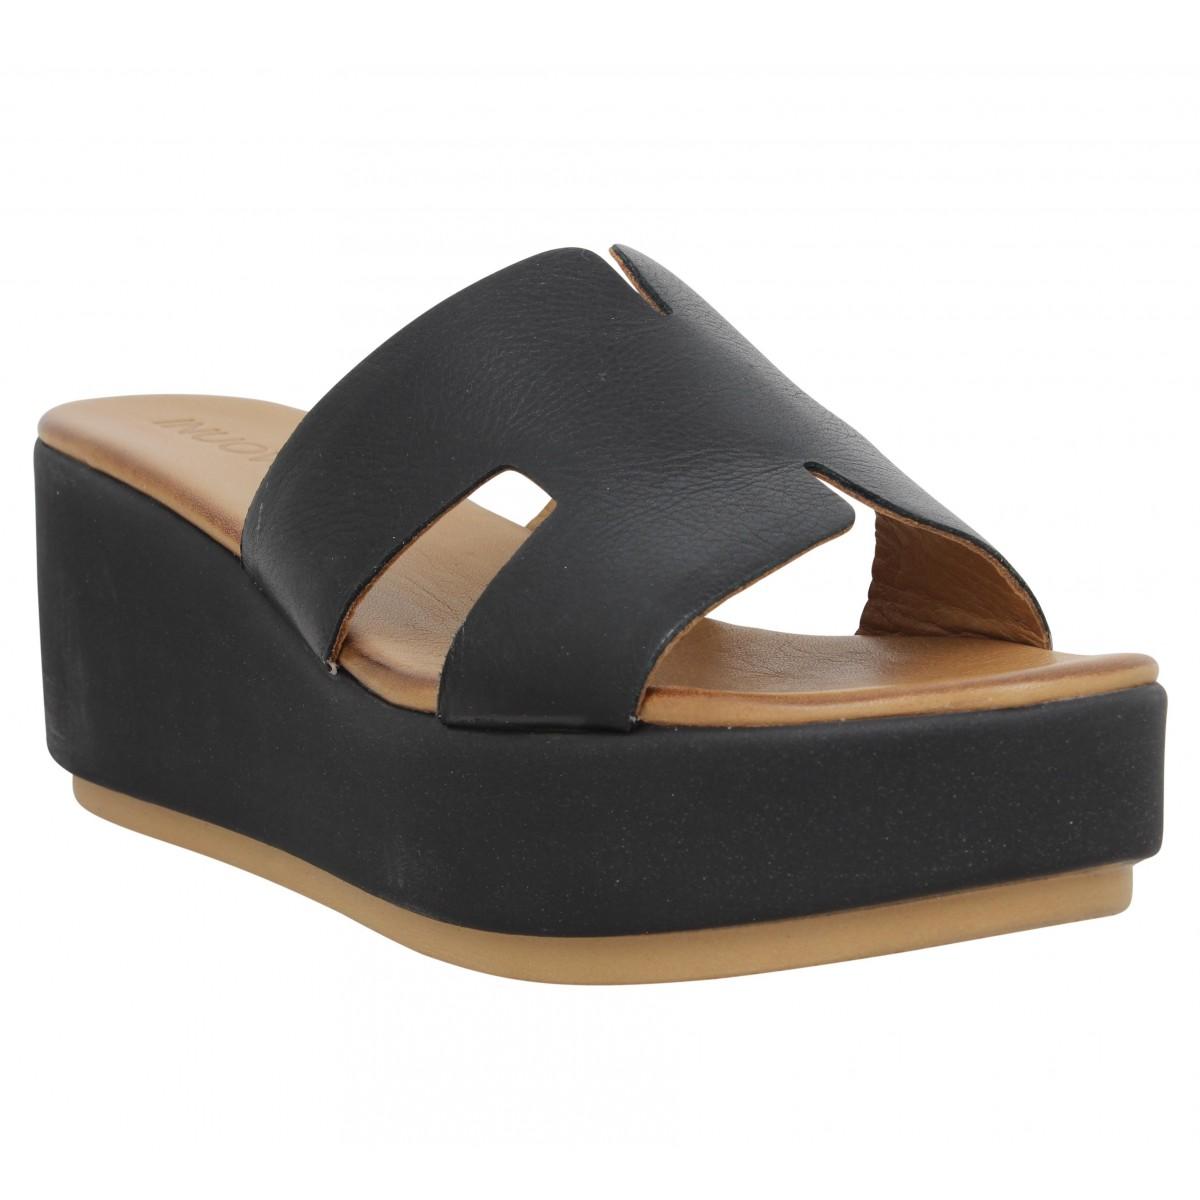 Sandales talons INUOVO 123039 cuir Femme Noir